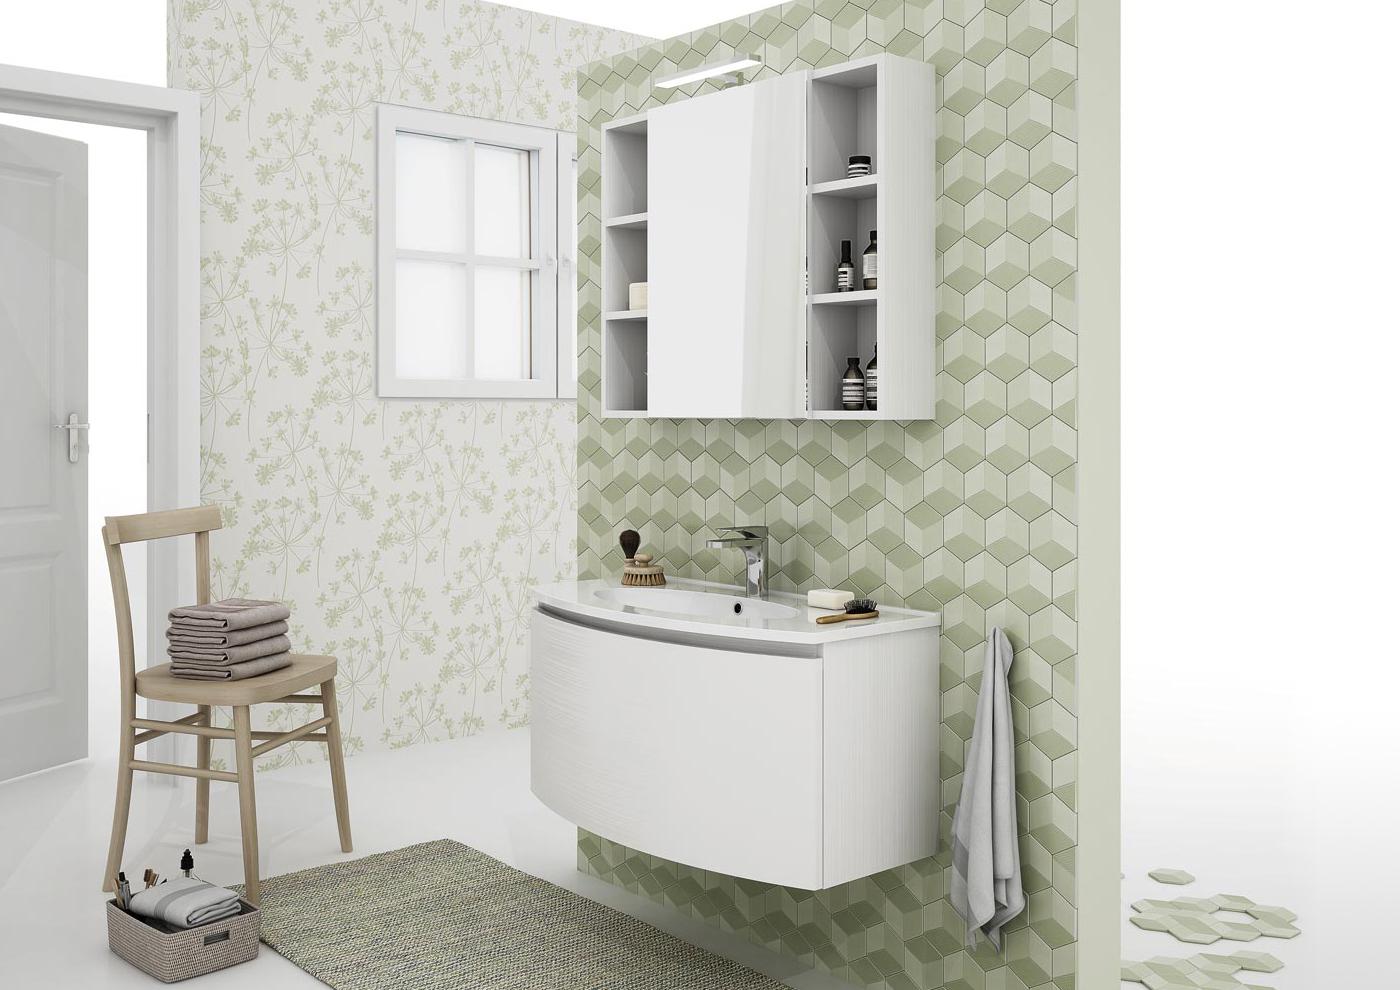 catalogo semeraro mobili 2014 foto design mag. mobili bagno rosa mobili bagno vintage mobile ...